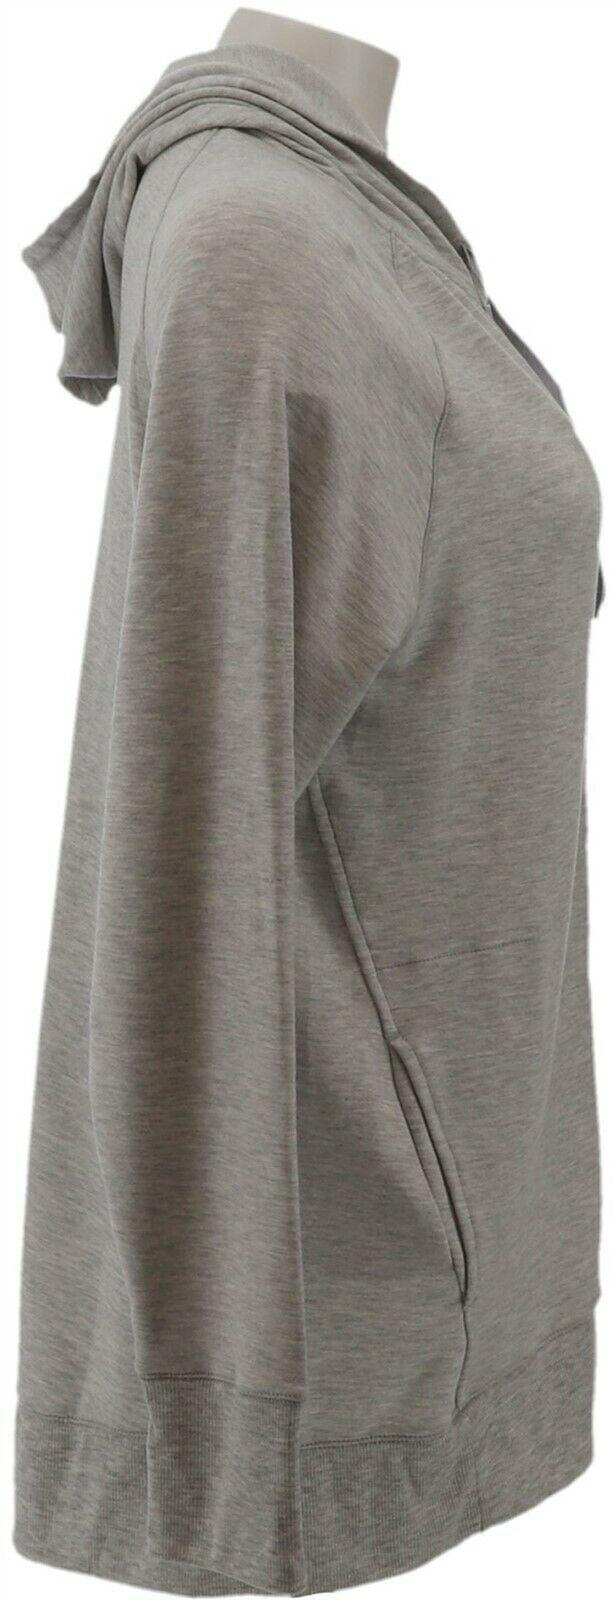 Cuddl Duds Soft Comfort Full Zip Hooded Sweatshirt Lt Grey Hther 1X NEW A301275